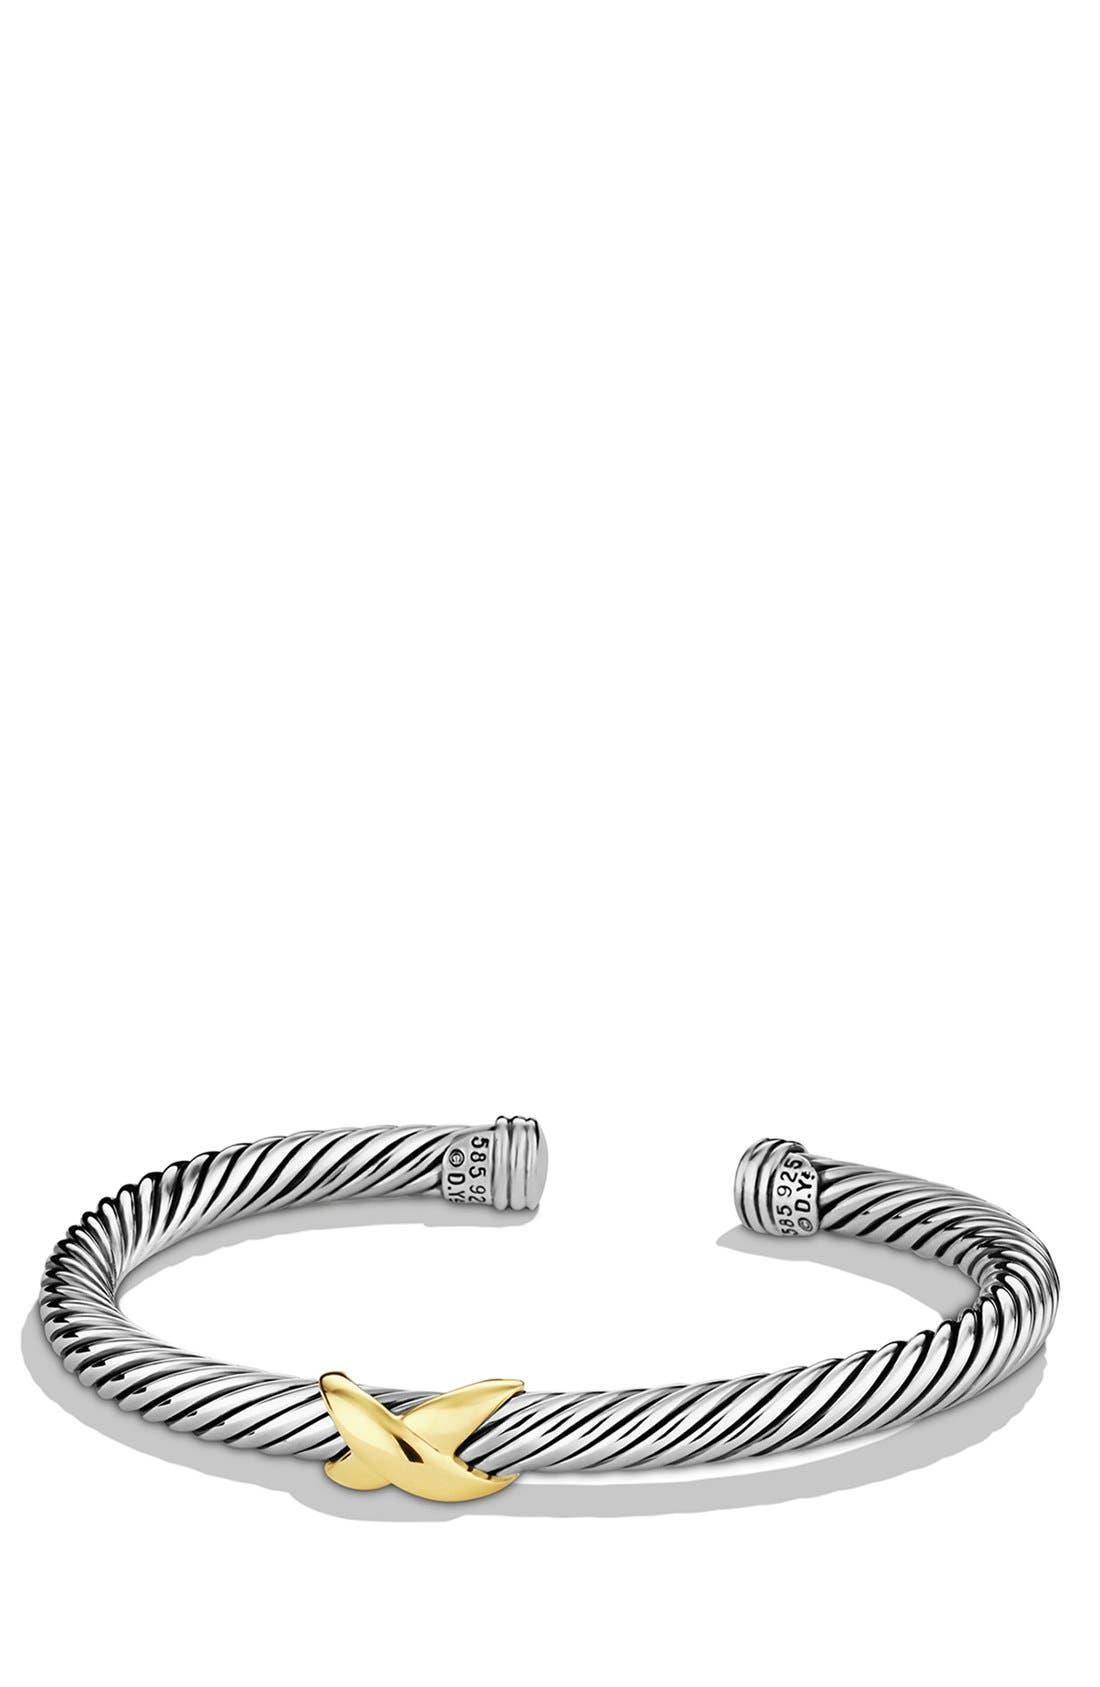 david yurman u0027xu0027 bracelet with gold